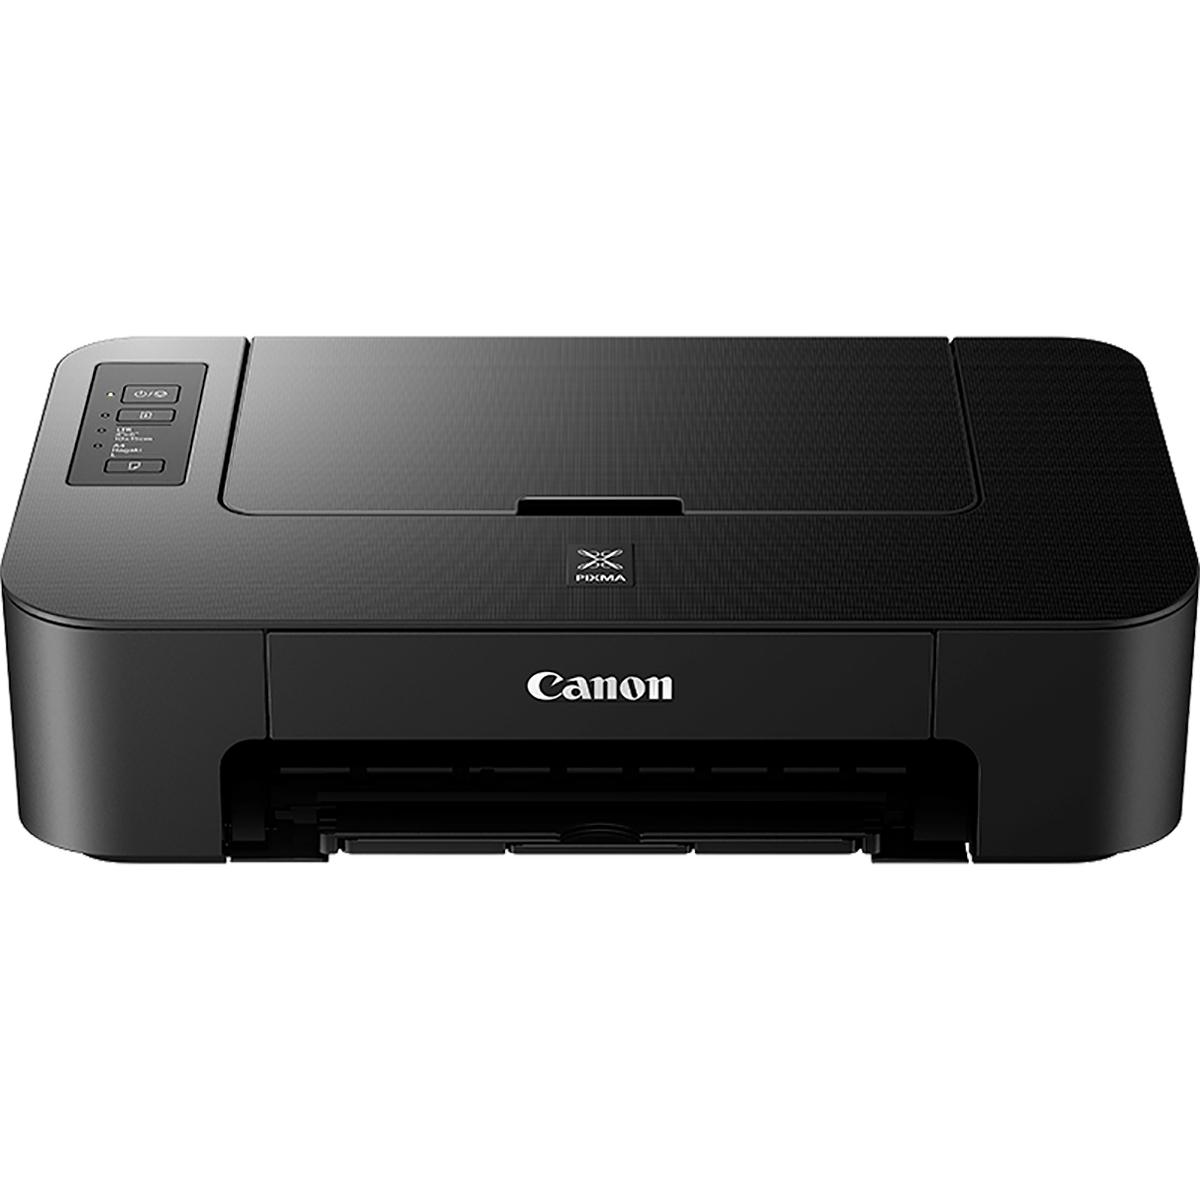 Canon PIXMA TS205 A4 Inkjet Printer